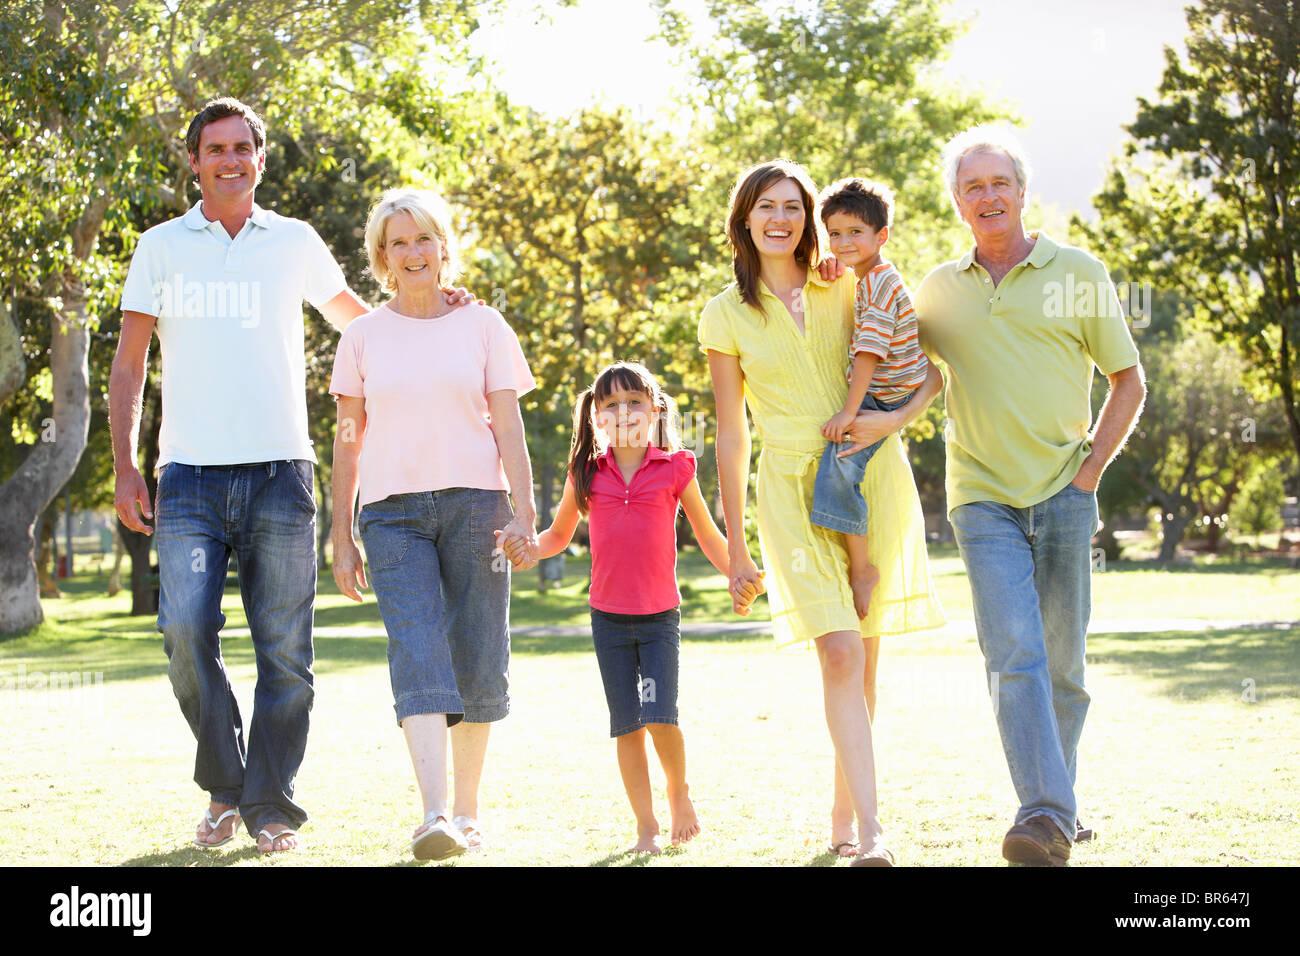 Extended Group Portrait Of Family Enjoying Walk In Park - Stock Image